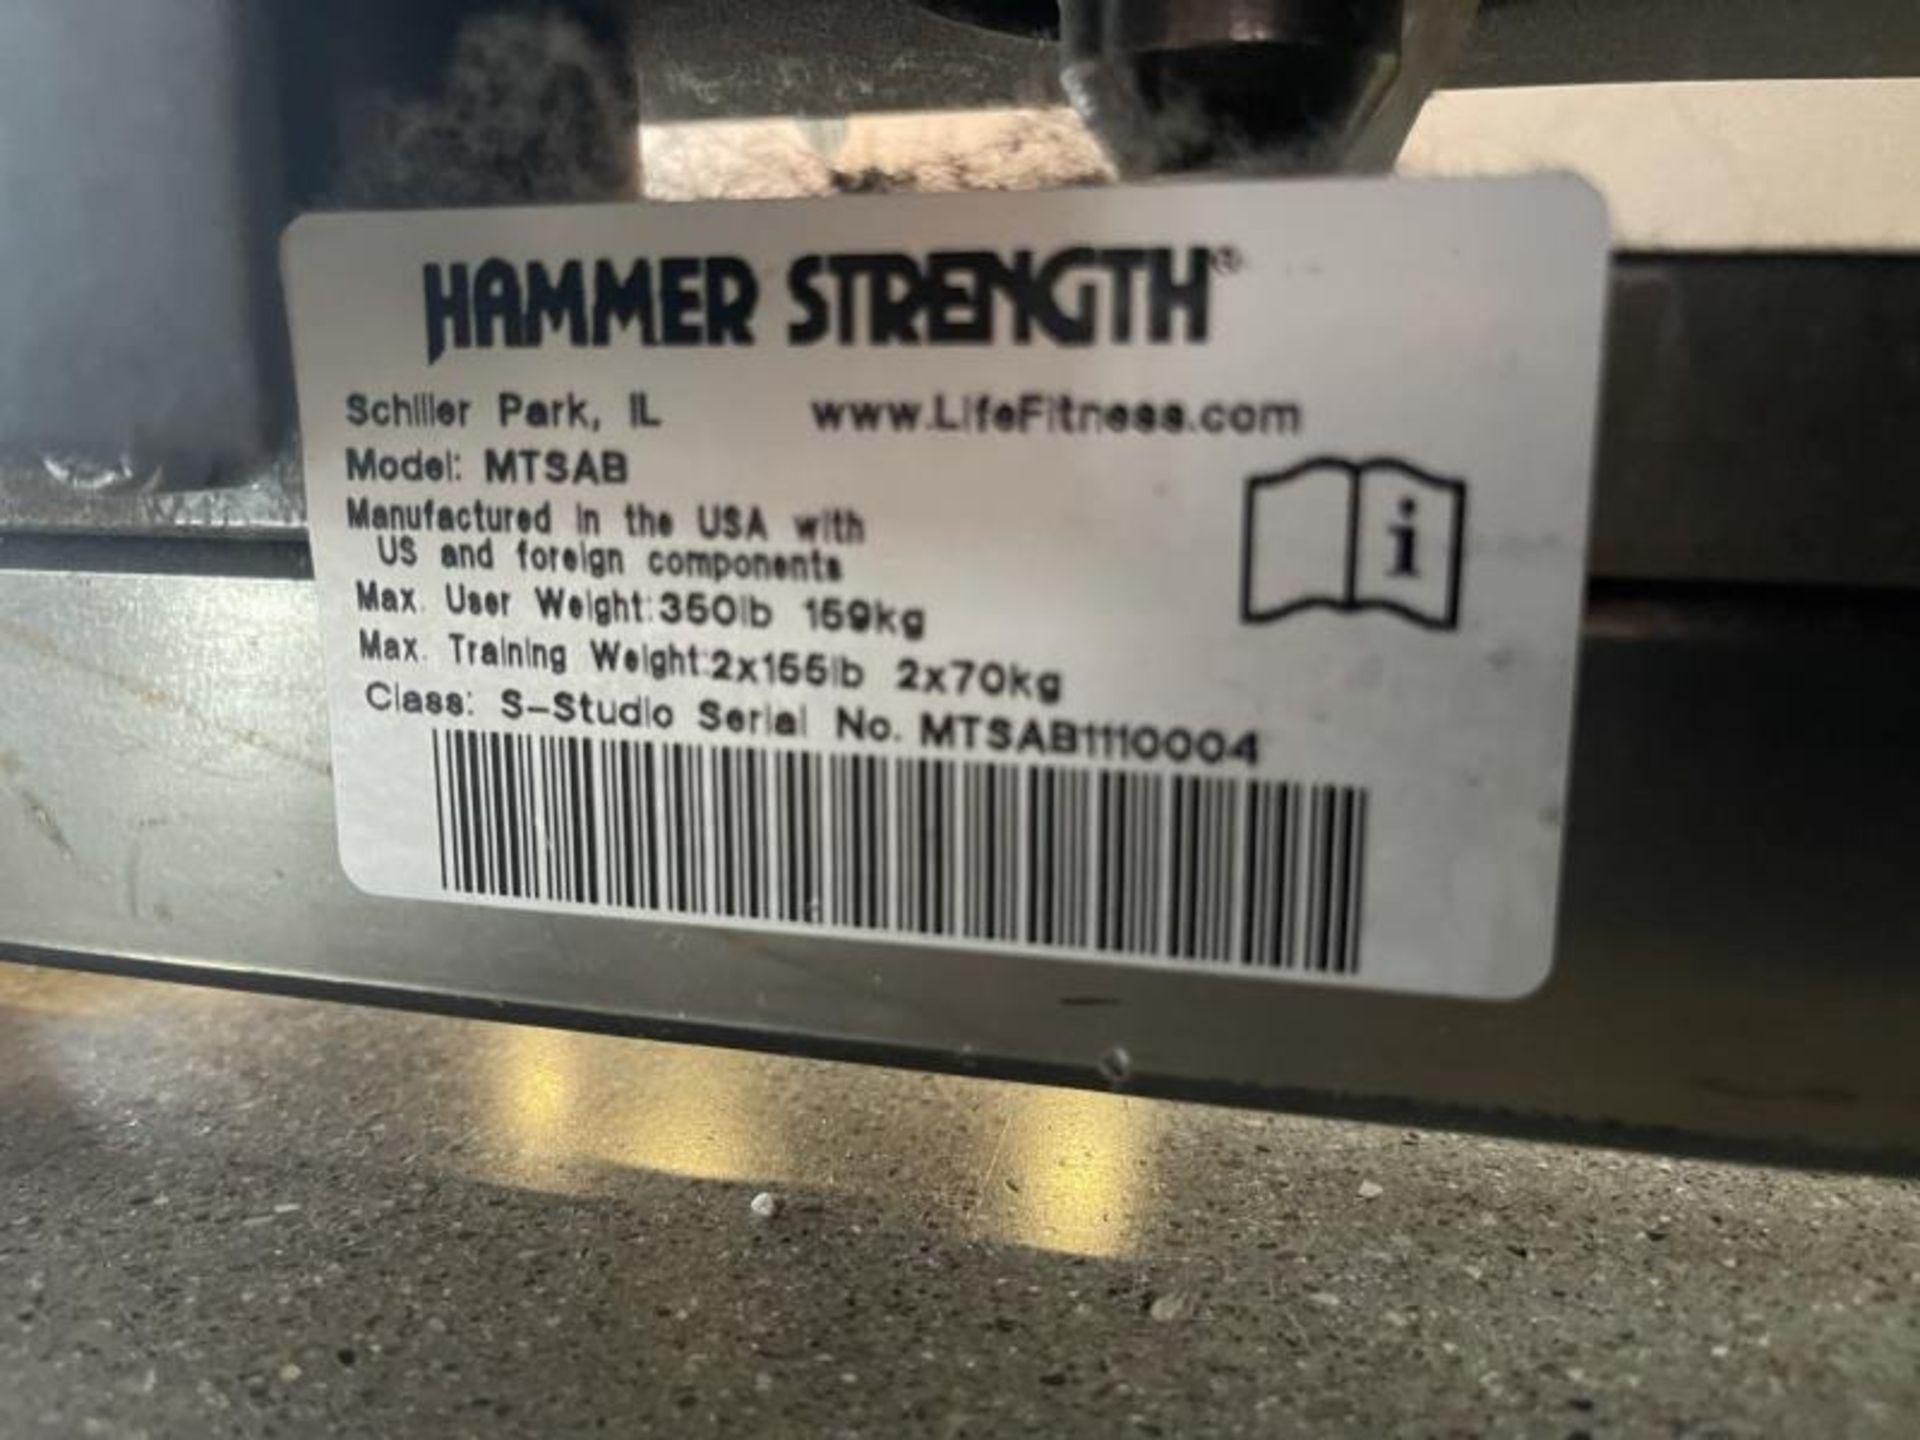 Hammer Strength MTS Abdominal Crunch M: MTSAB - Image 7 of 7